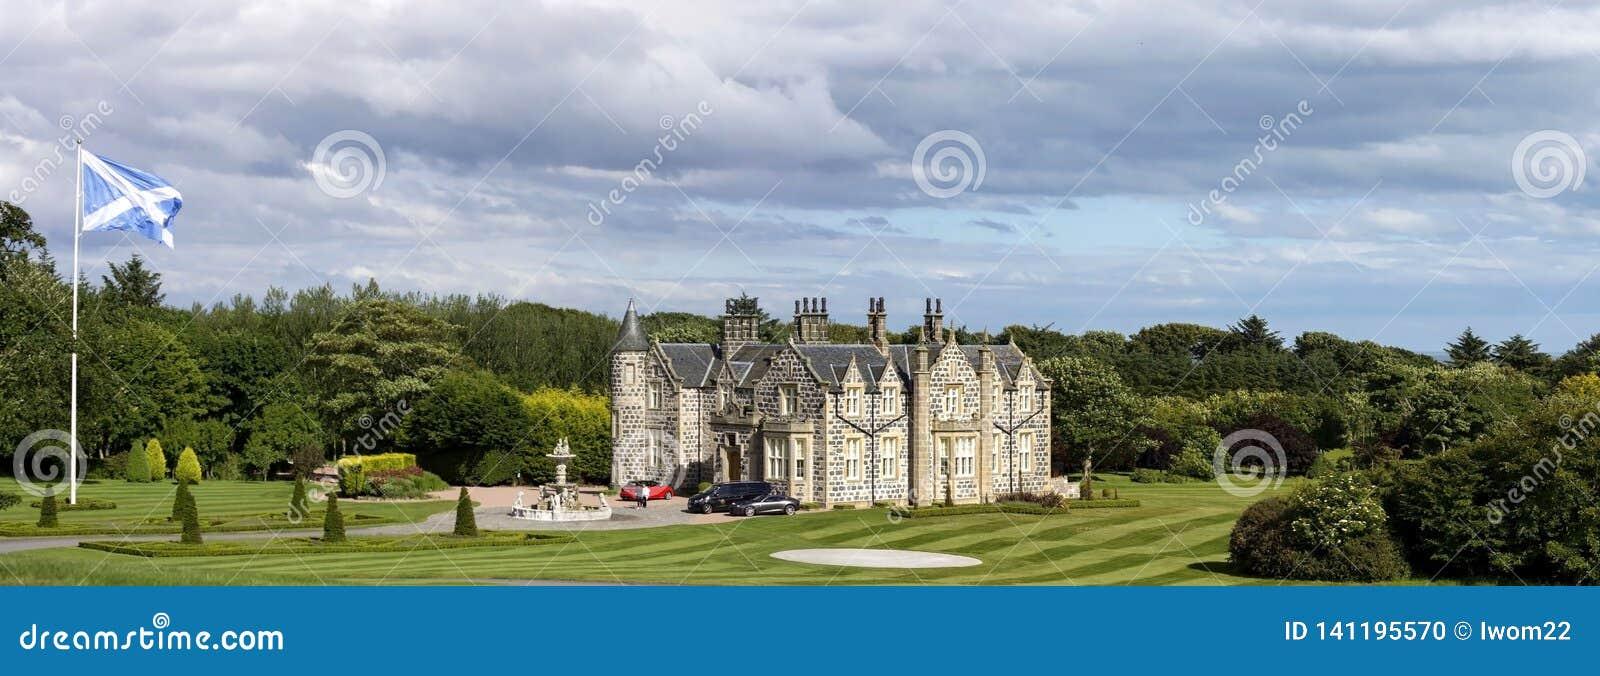 Le terrain de golf international de Donald Trump Balmedie, Aberdeenshire, Ecosse